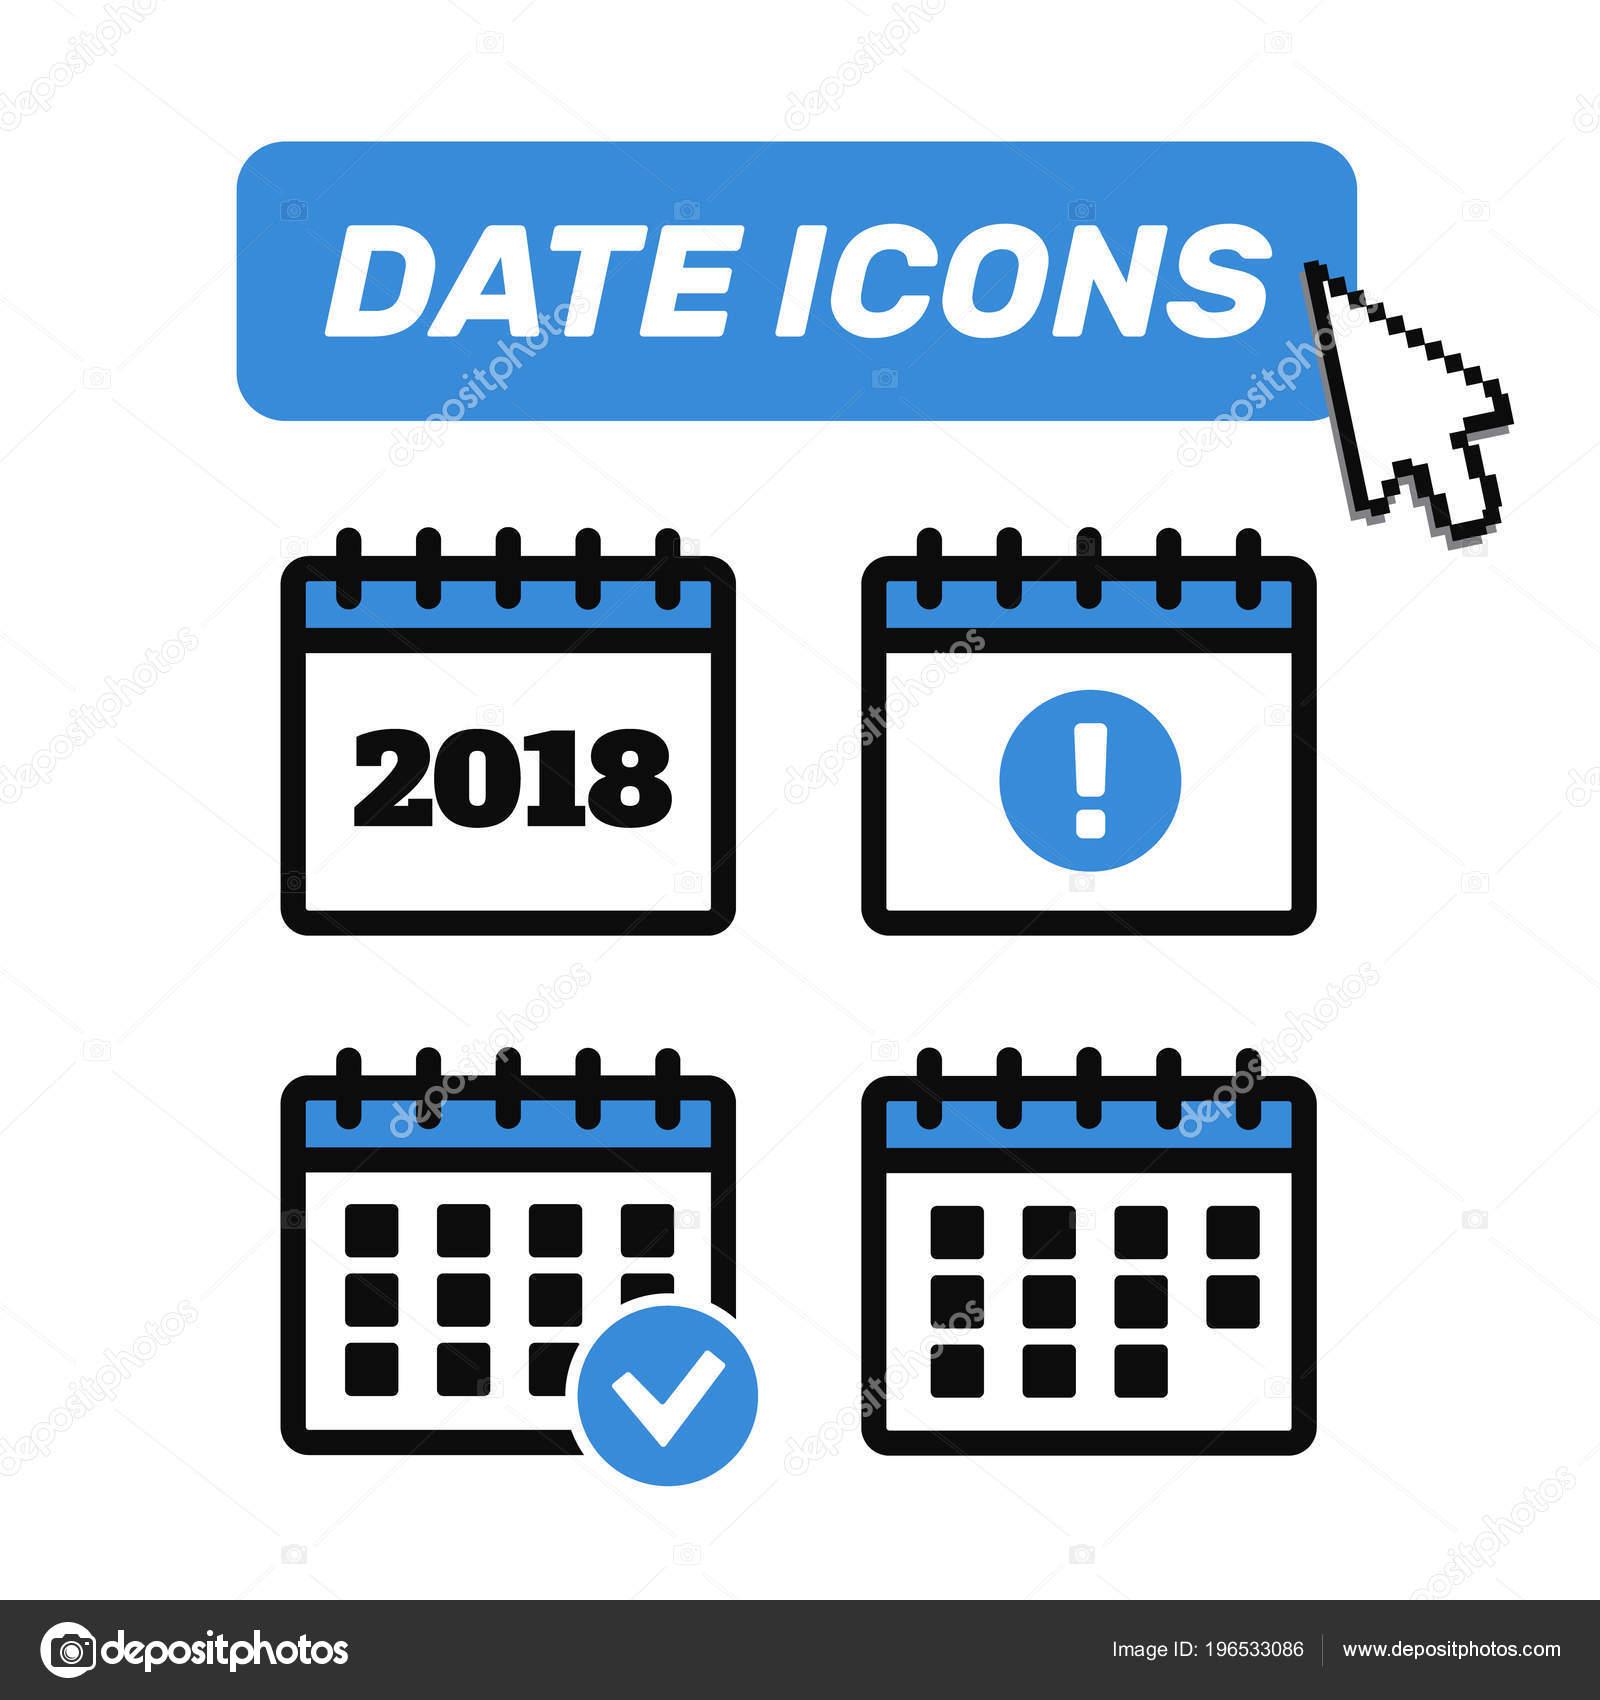 Calendario Vector.Icones Calendario Vetor Icone Evento Sinal Vector Calendario Vector